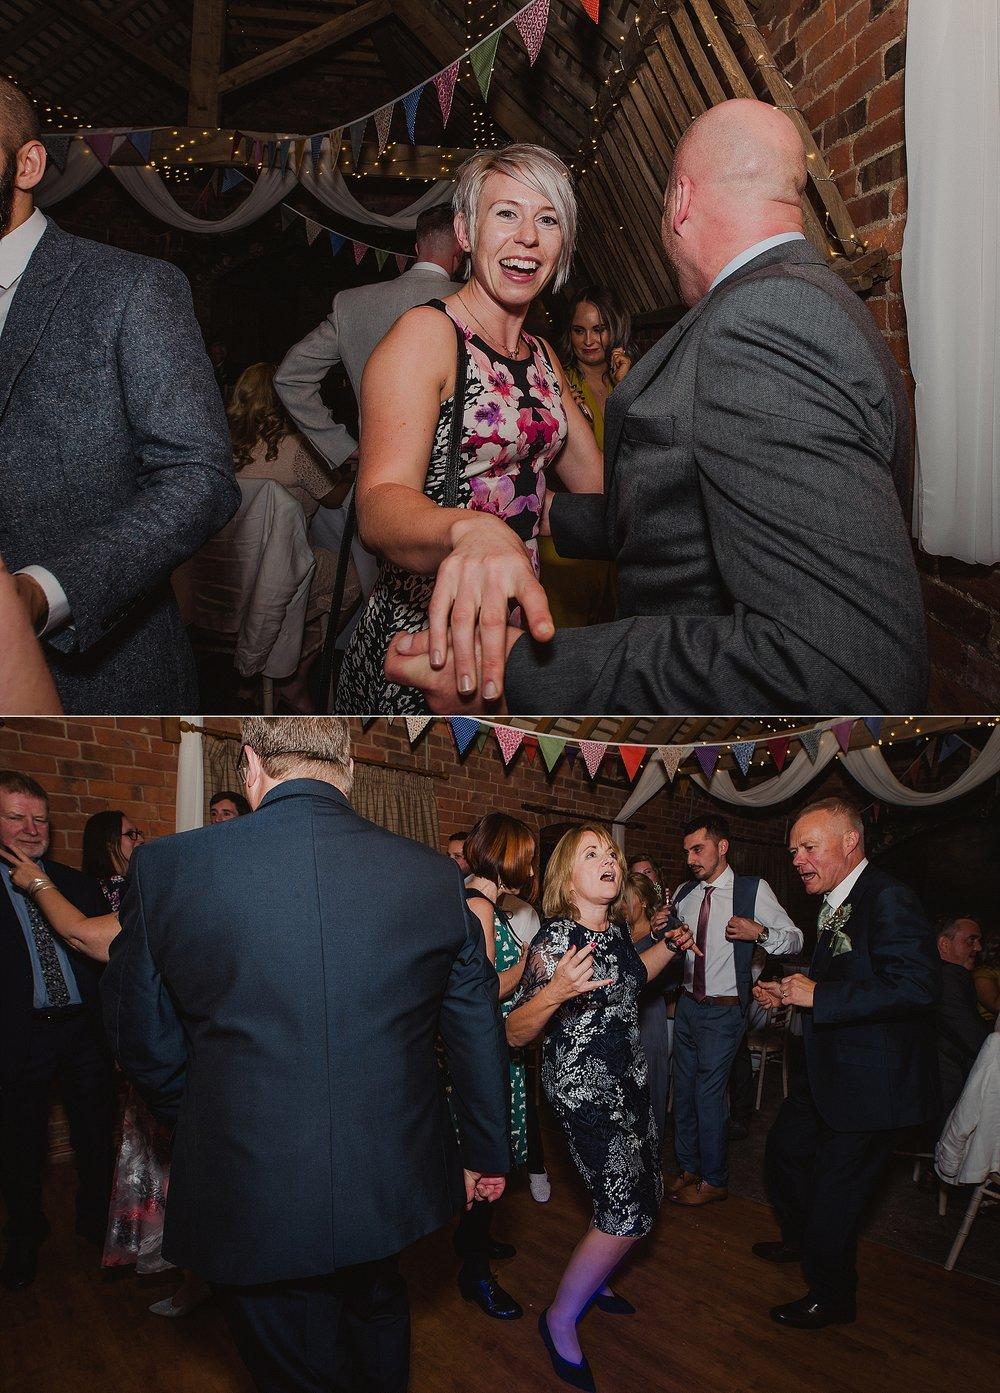 chris_keely_downton_lodge_wedding_0113.jpg